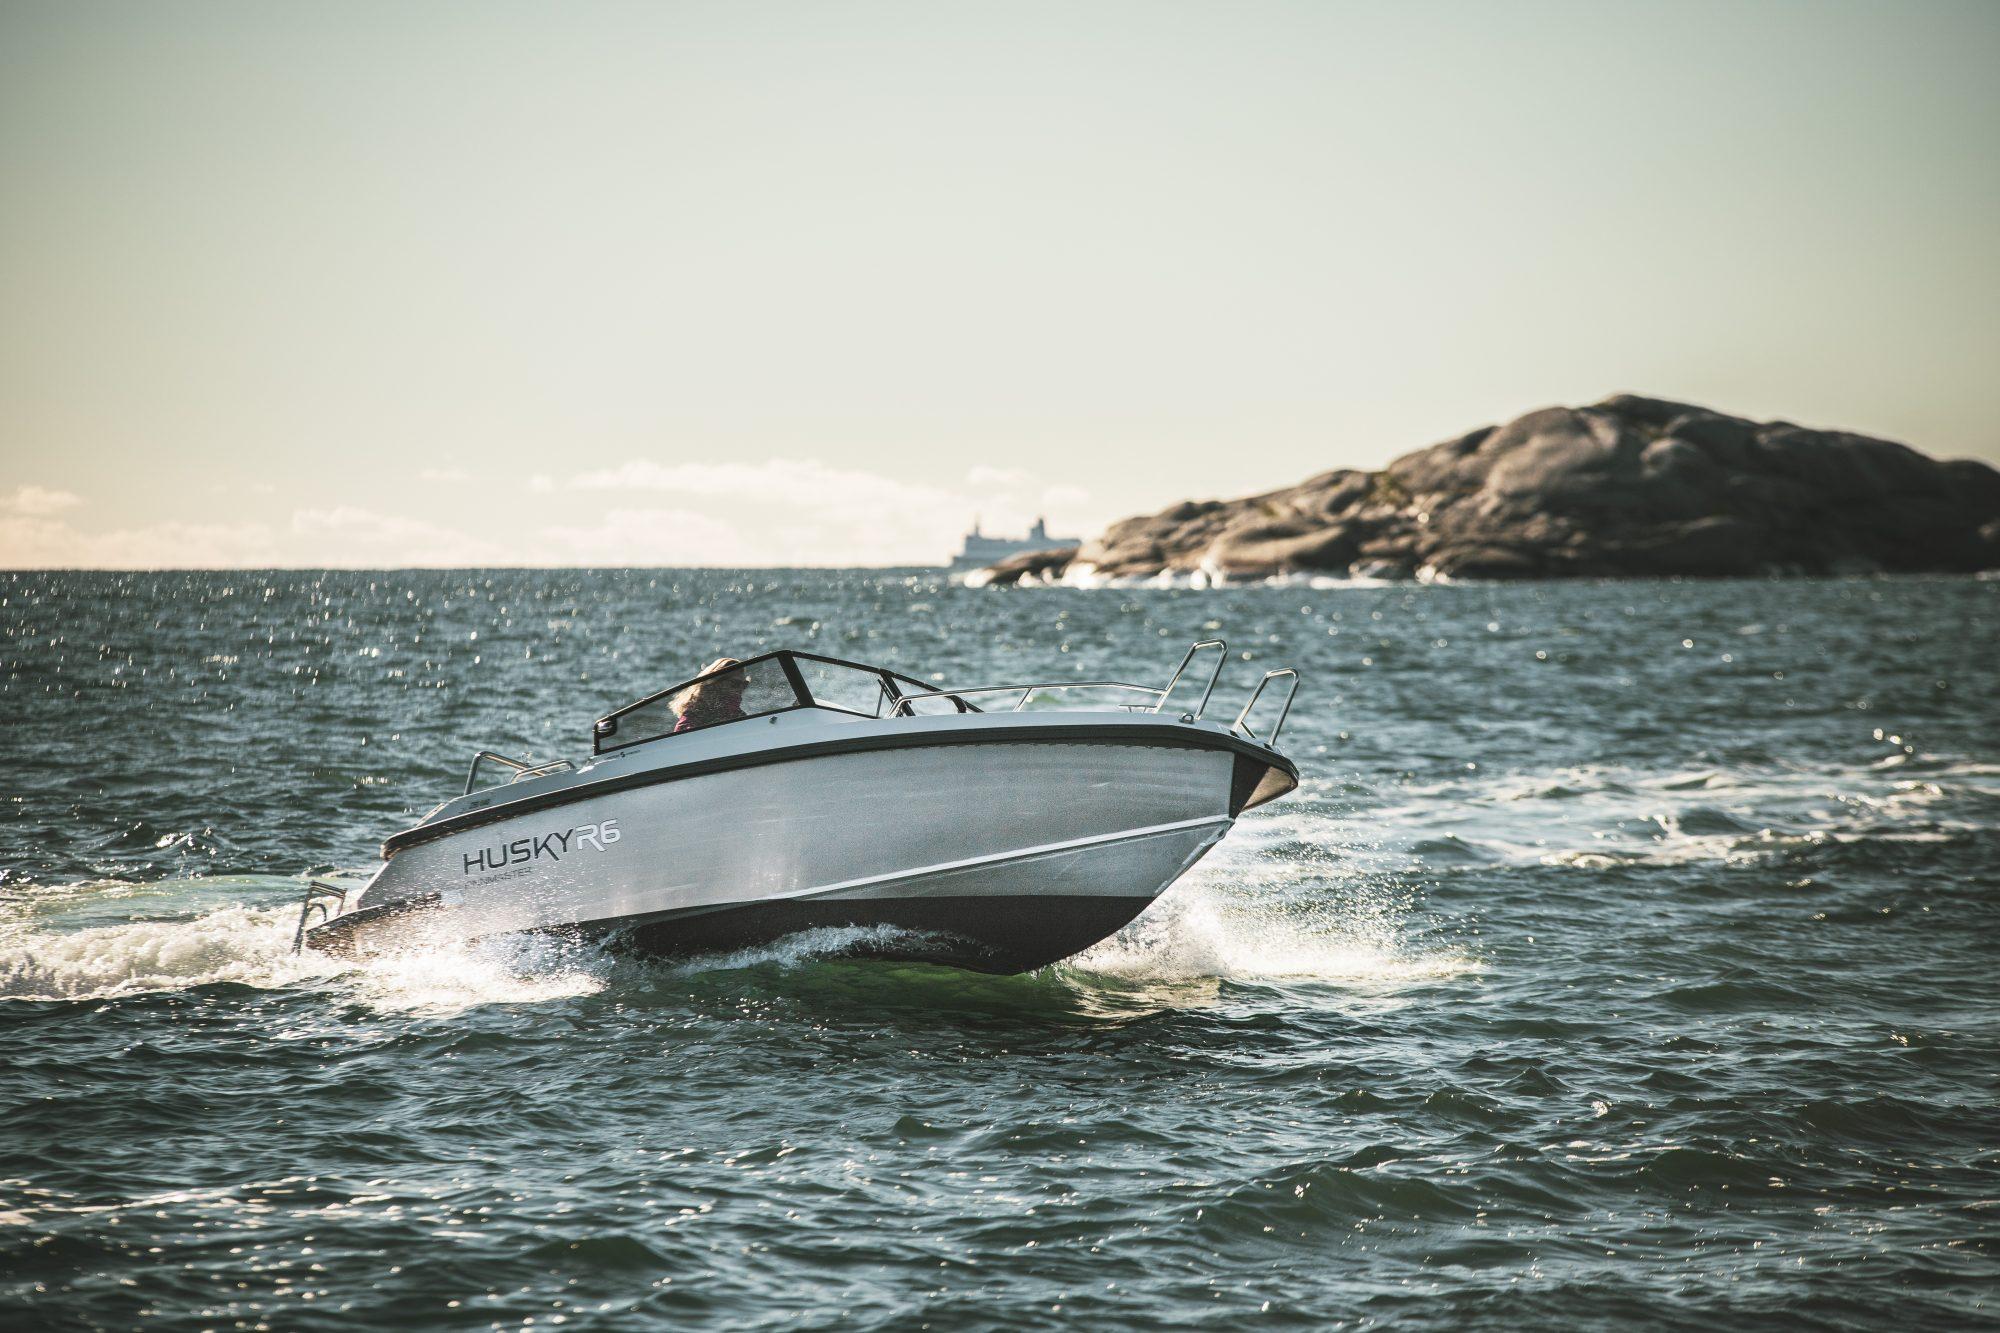 JOTUN YACHTING lanserer unikt bunnstoff for aluminiumsbåter